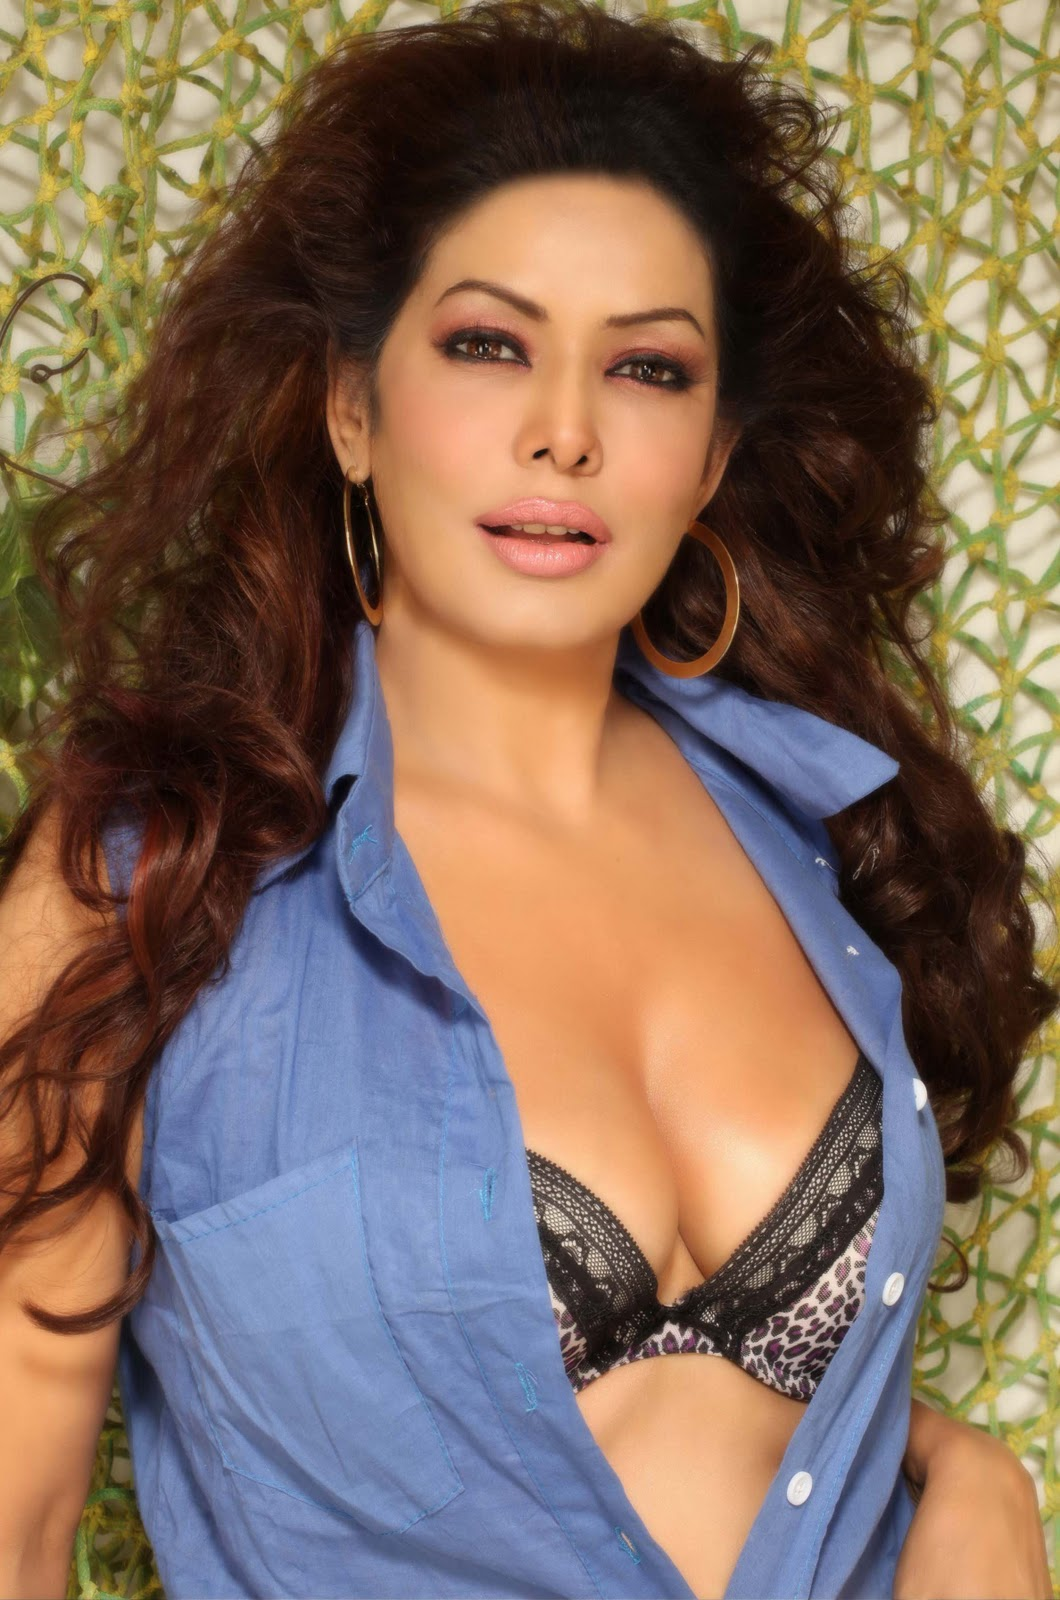 Poonam jhawar nude Nude Photos 9